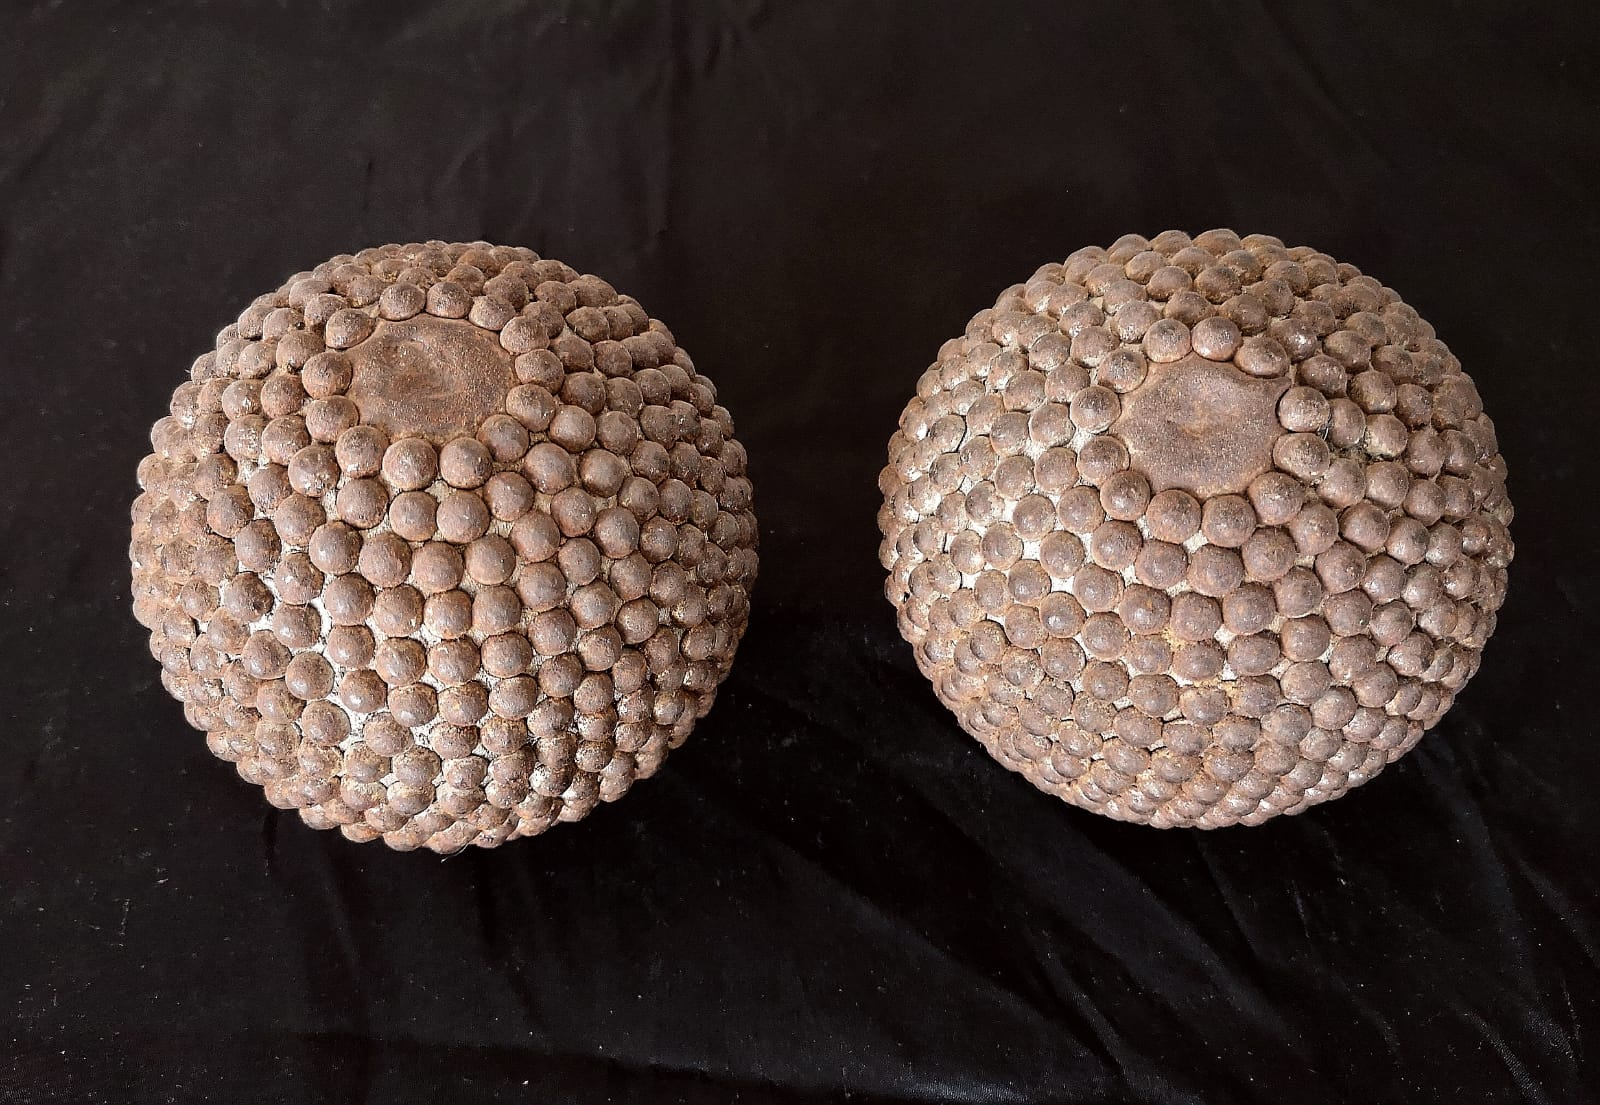 Antikes Boule, Pétanque Kugel aus Holz, mit runden Nägeln